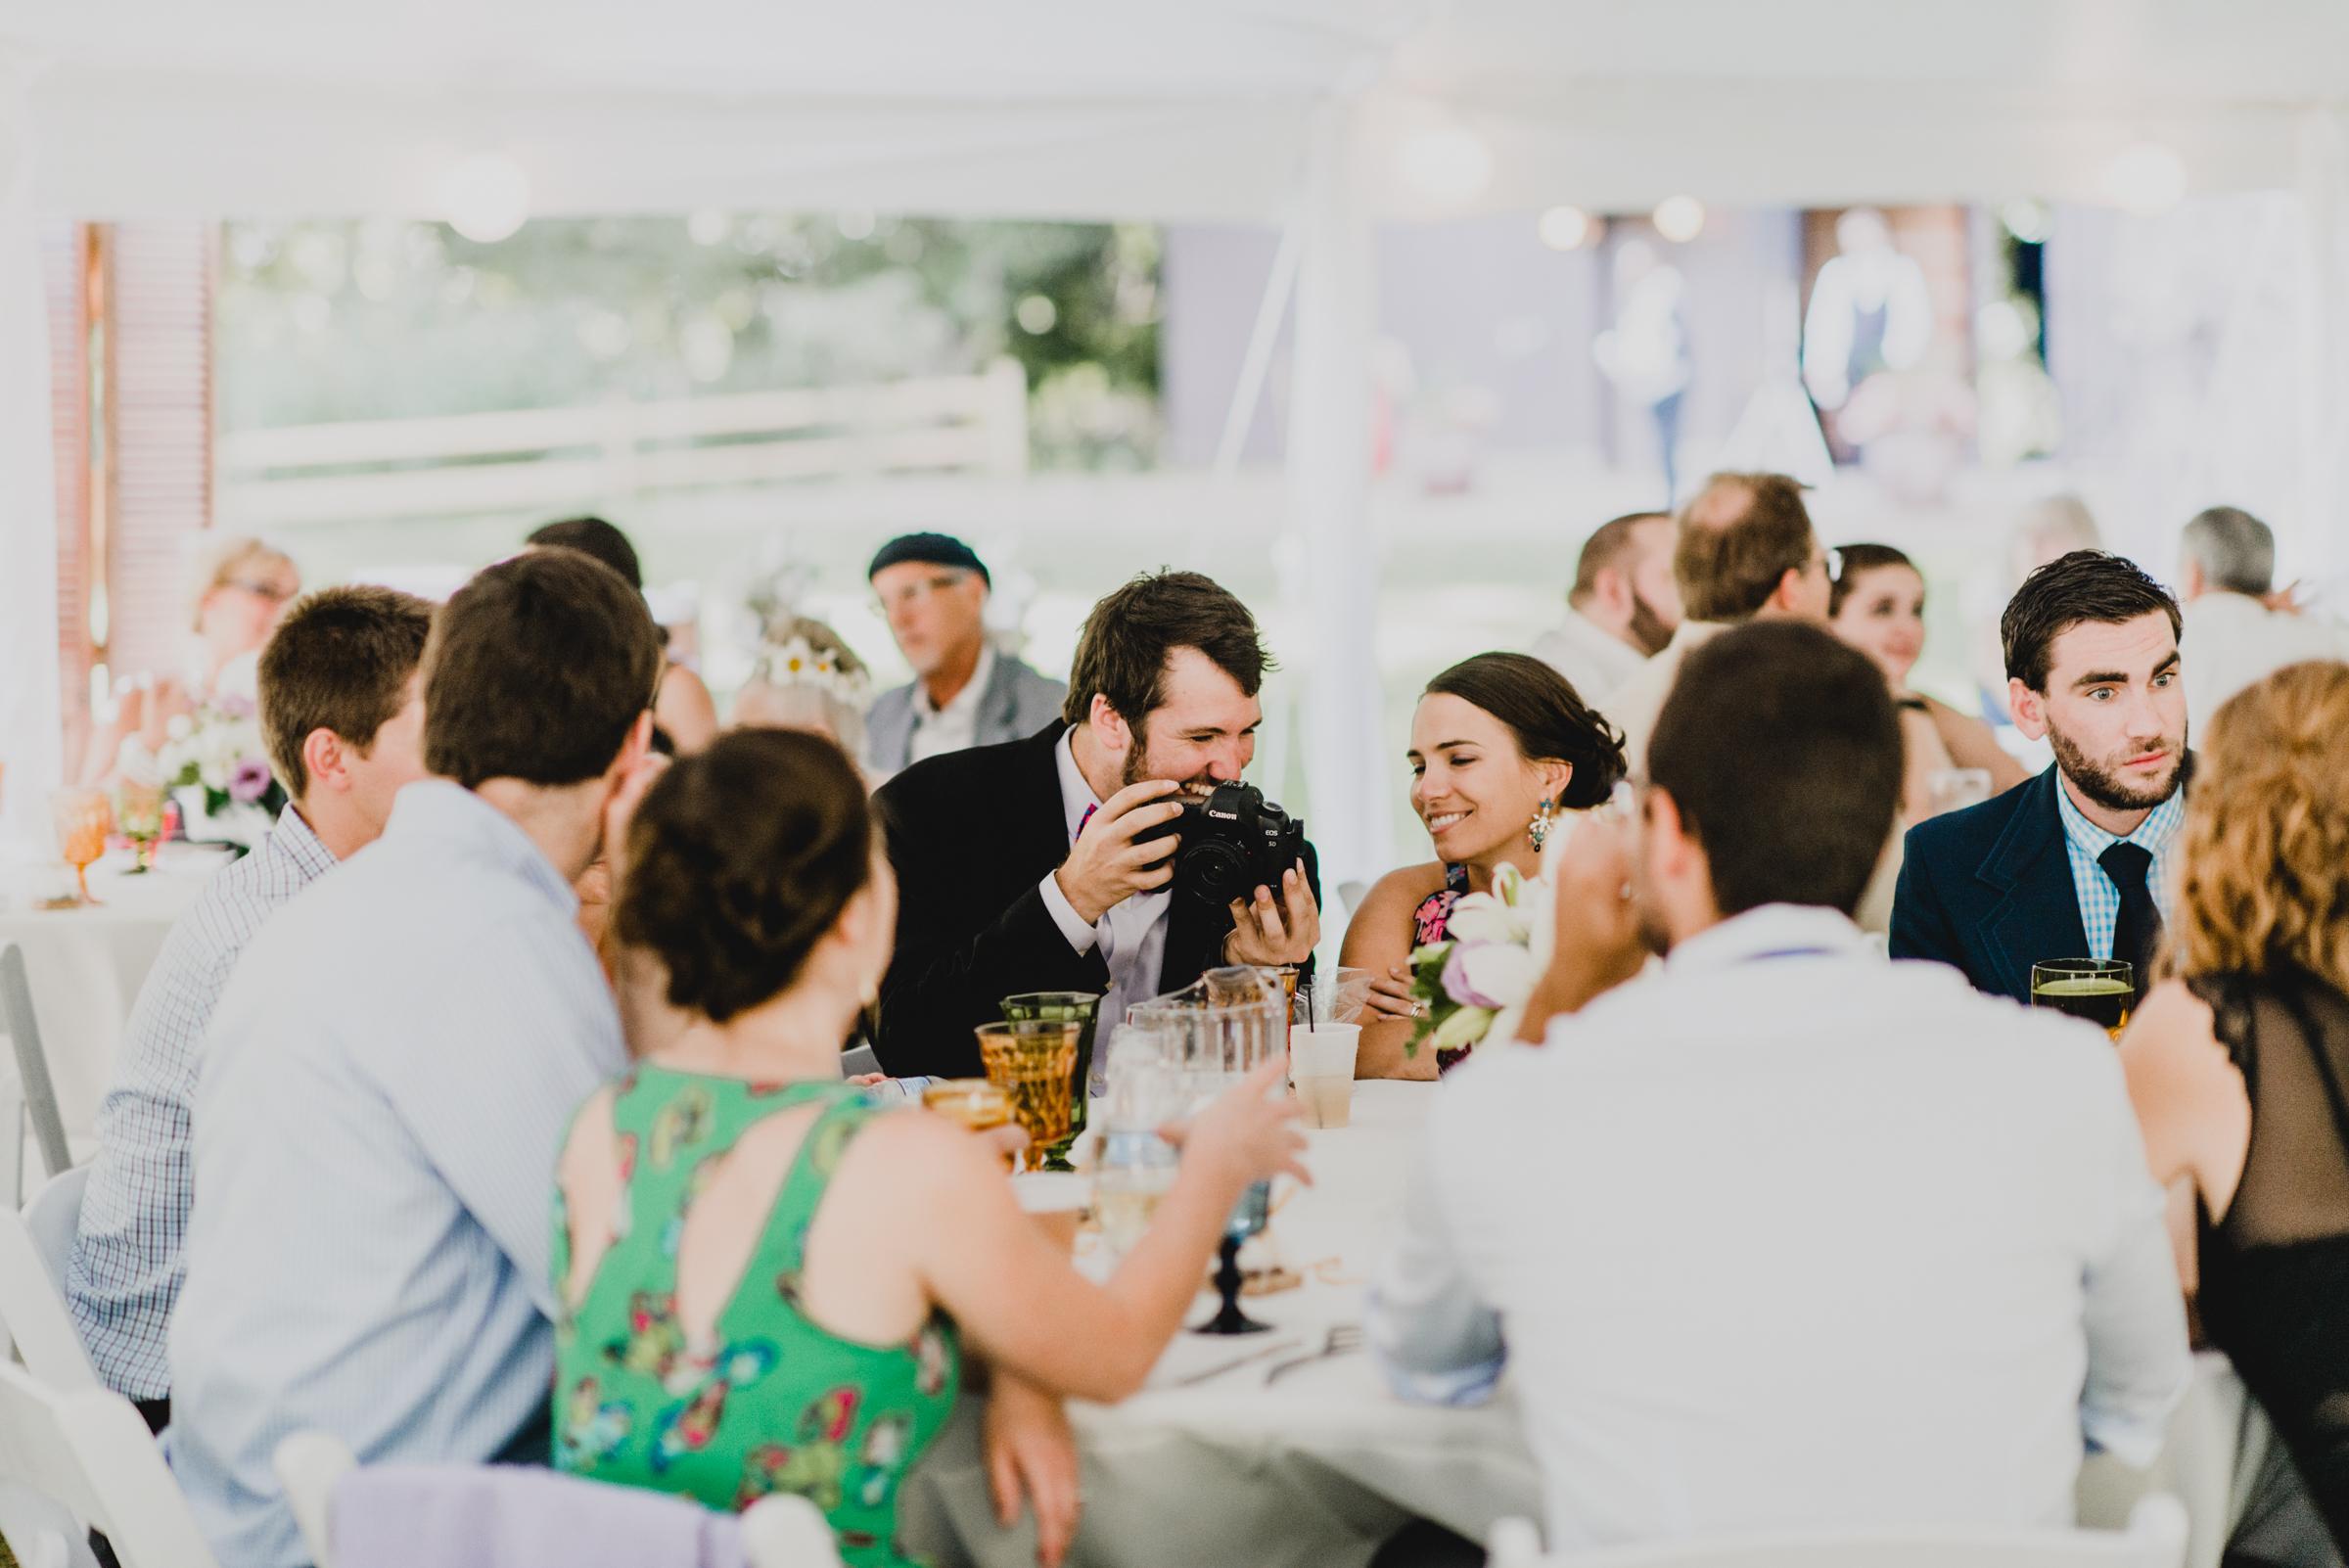 Intimate-Backyard-Farmhouse-Ohio-Wedding-Andi+Ben_Mallory+Justin-Photographers-204.JPG